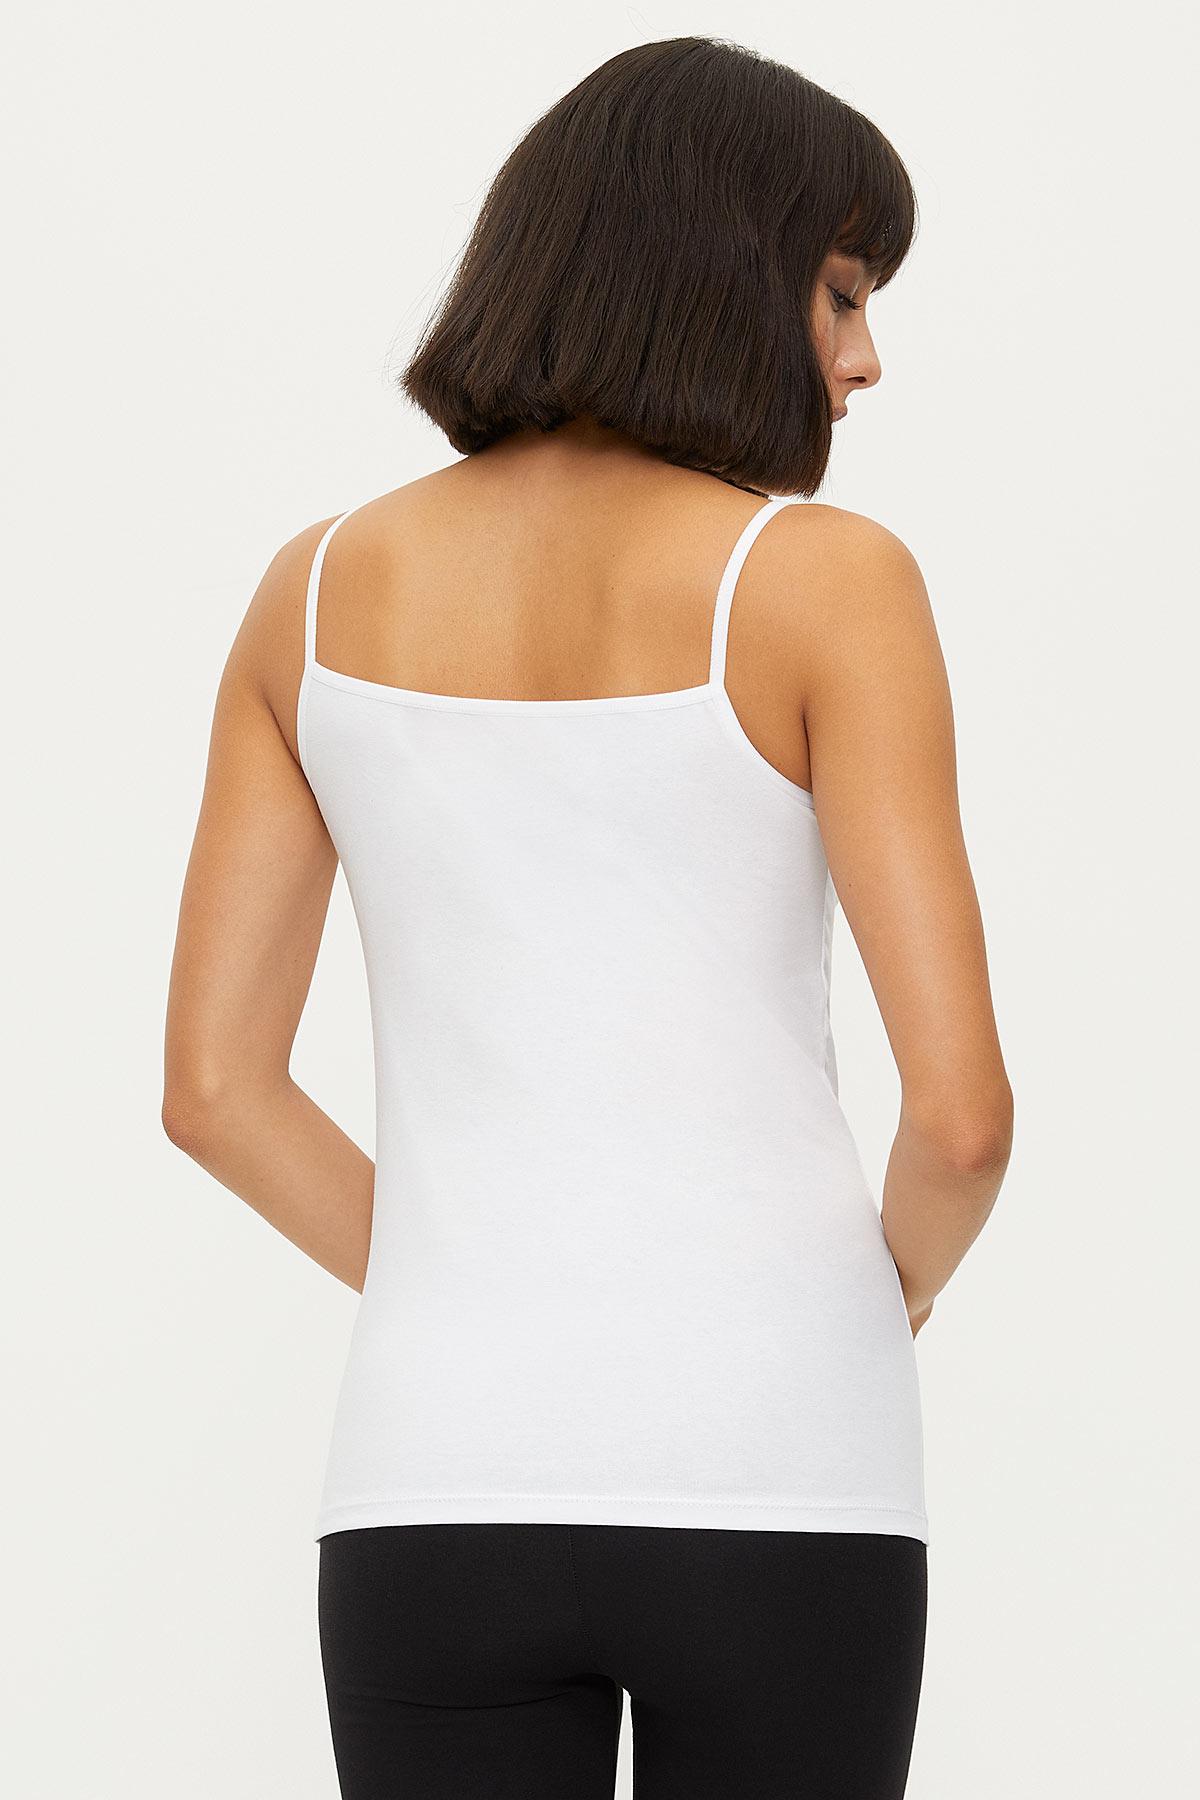 1275 Lycra Strappy Lace Women's Undershirt - Thumbnail